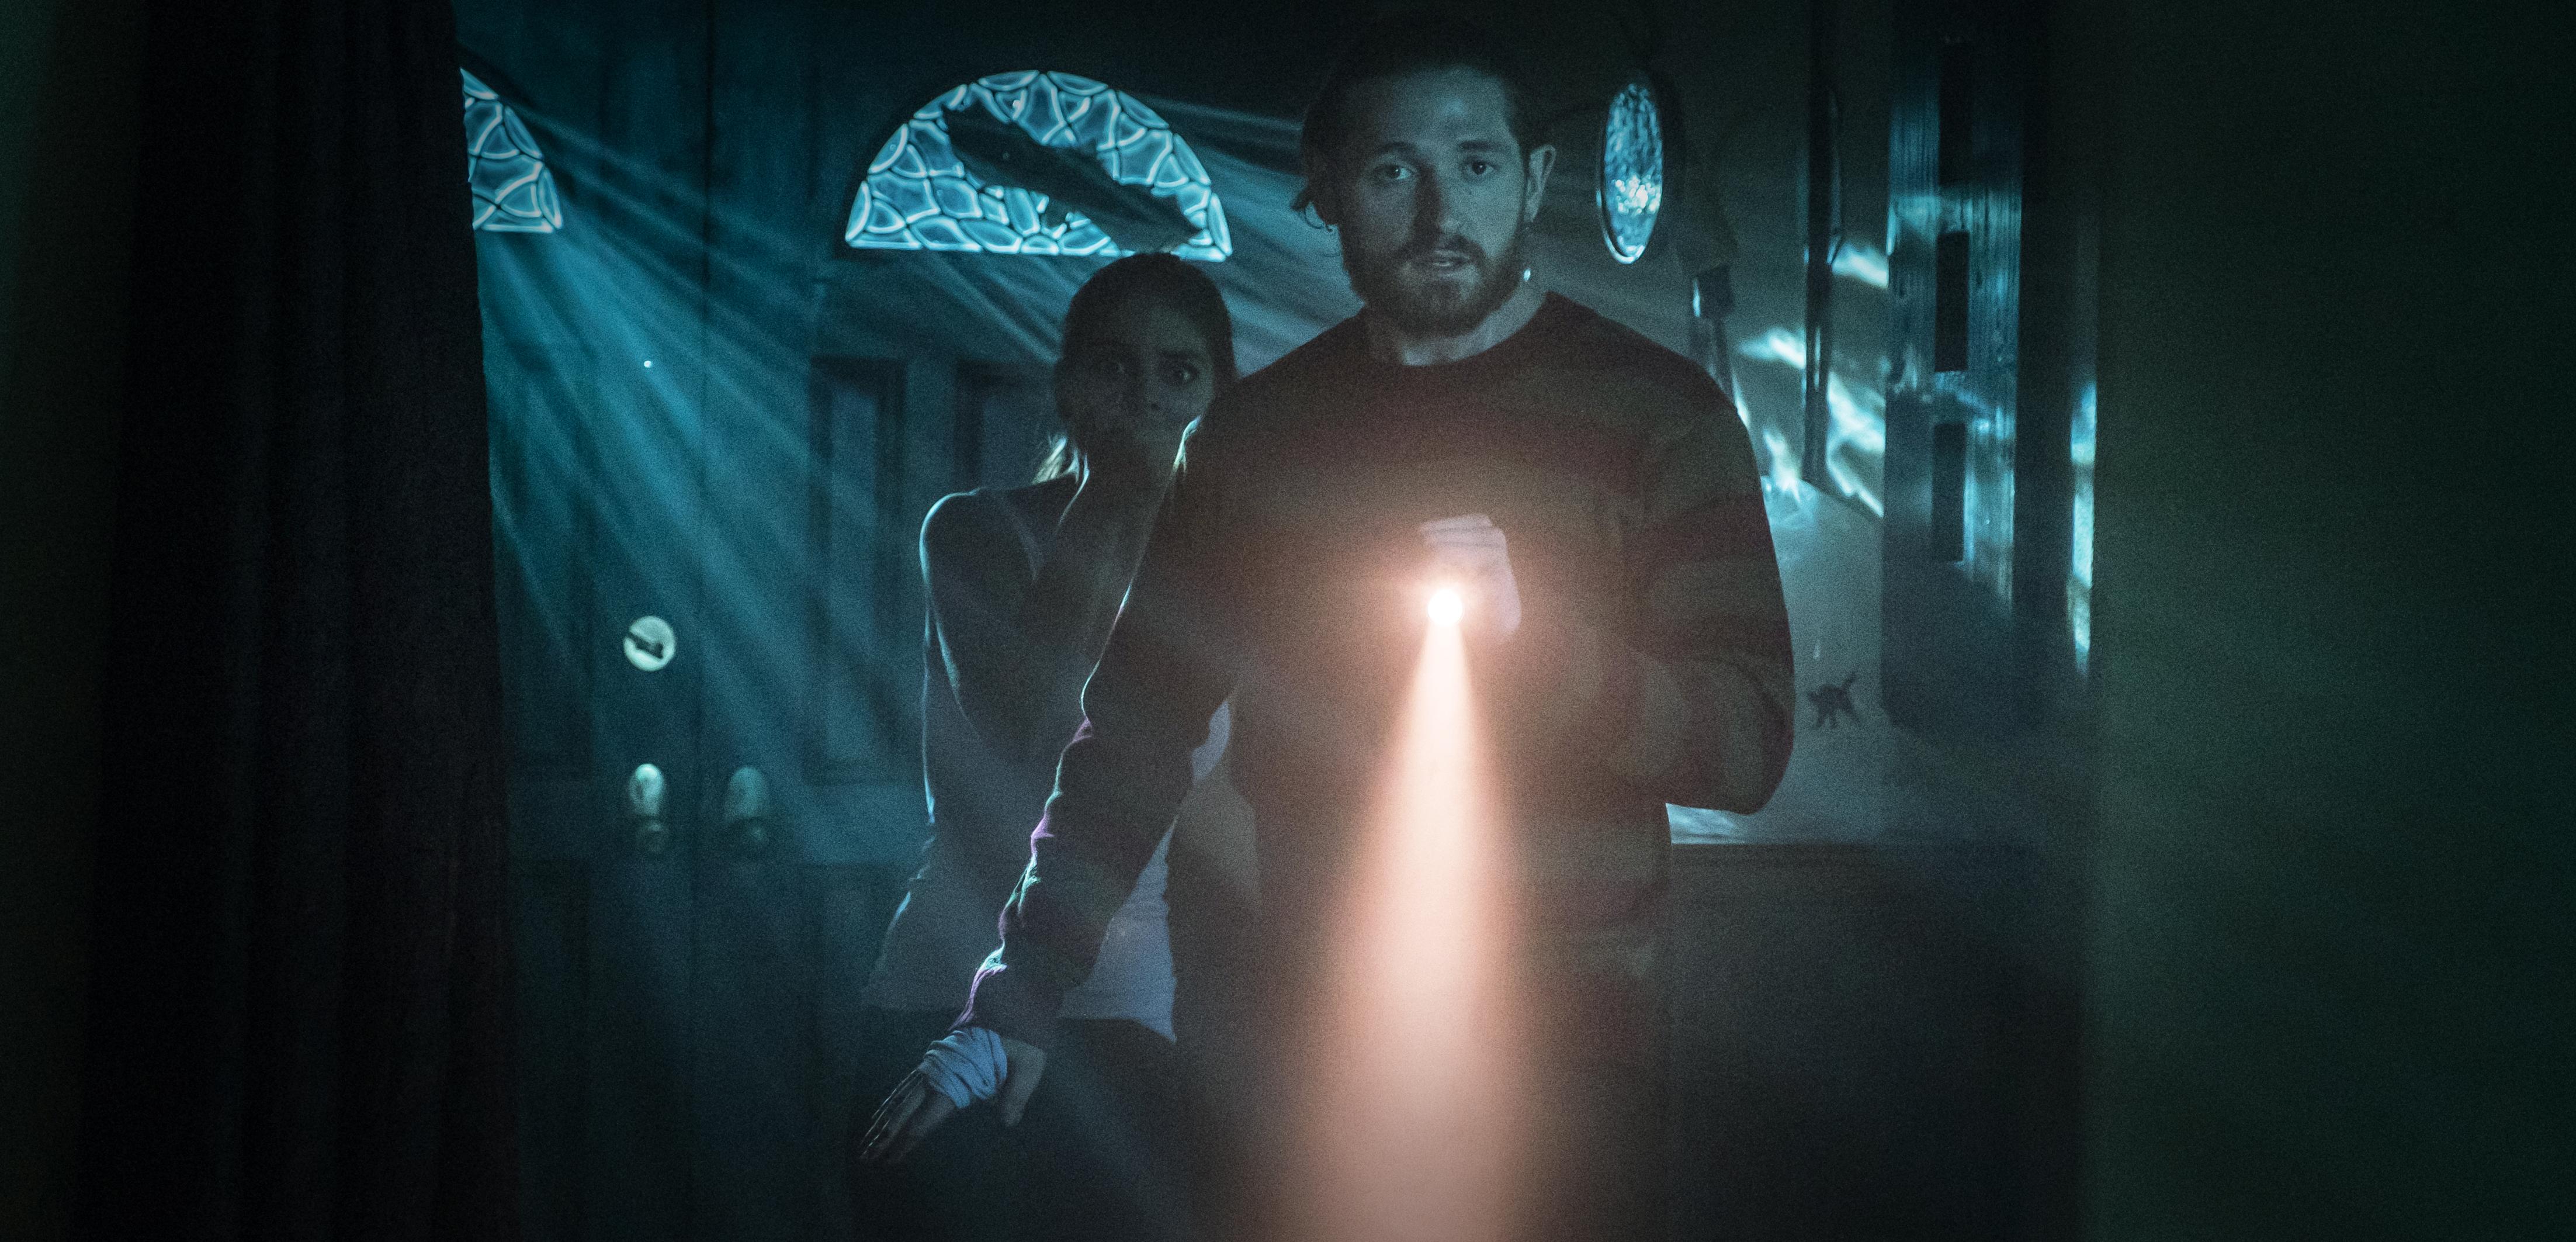 Joe Lindsey Flashlight in FEAR INC